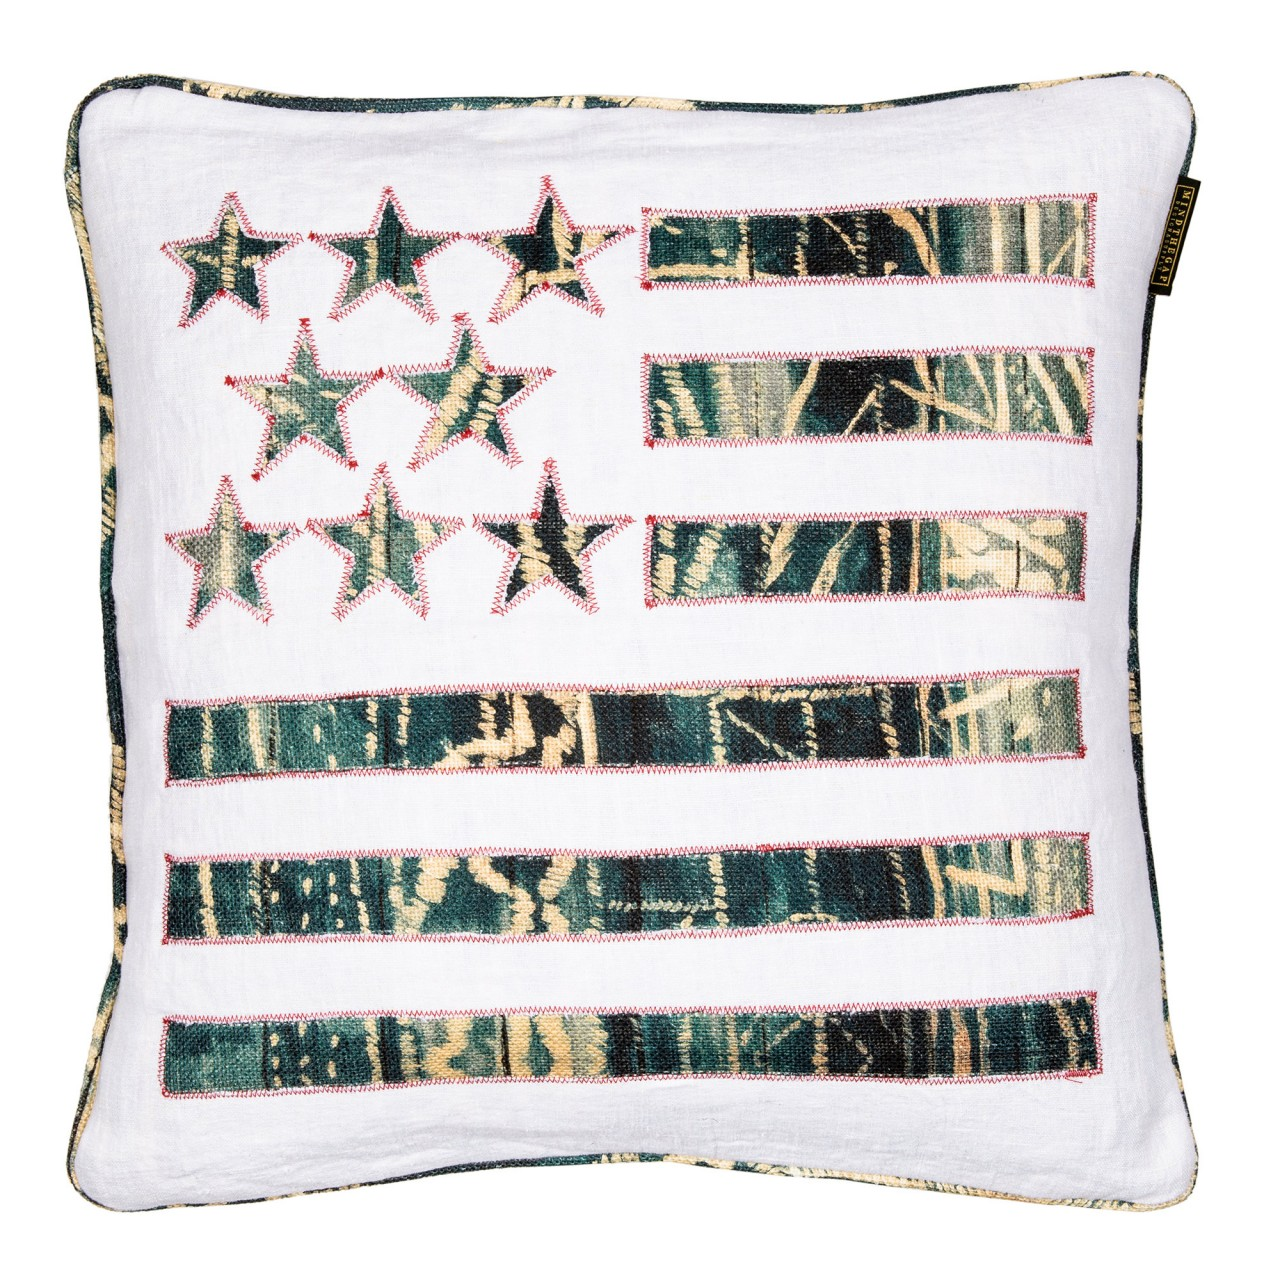 STARS AND STRIPES Linen Cushion